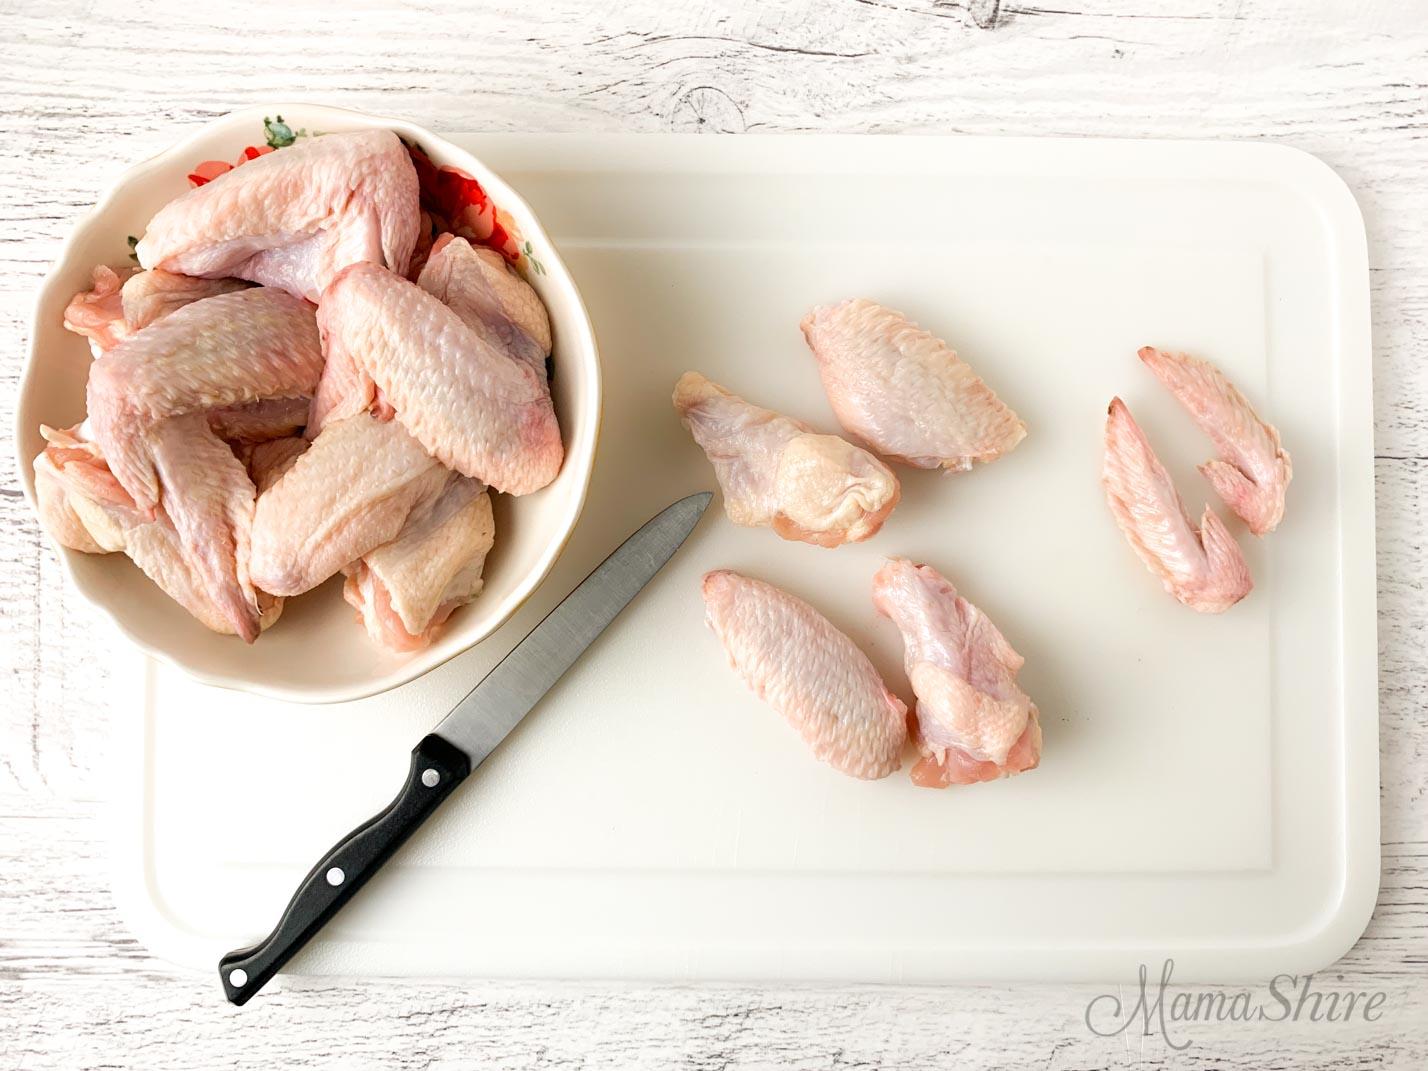 Chicken wings cut into three pieces.